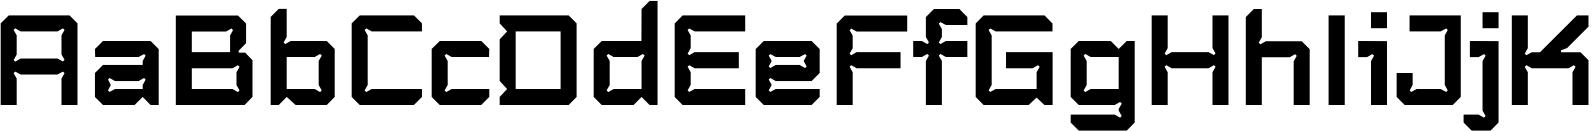 Trapper Sharp Family